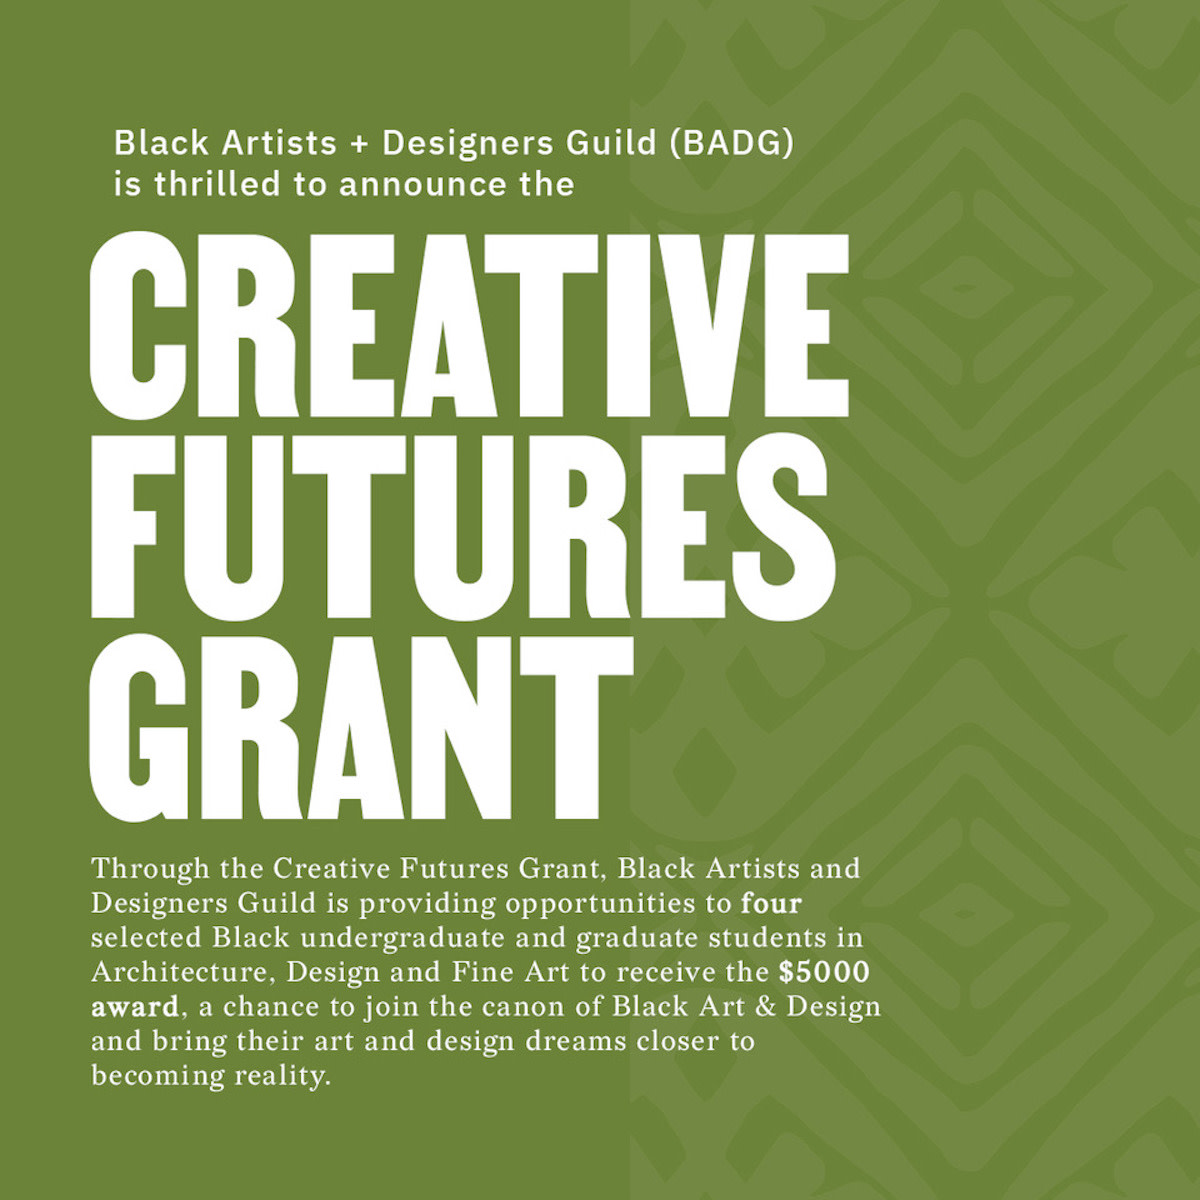 Creative Futures grant flyer.